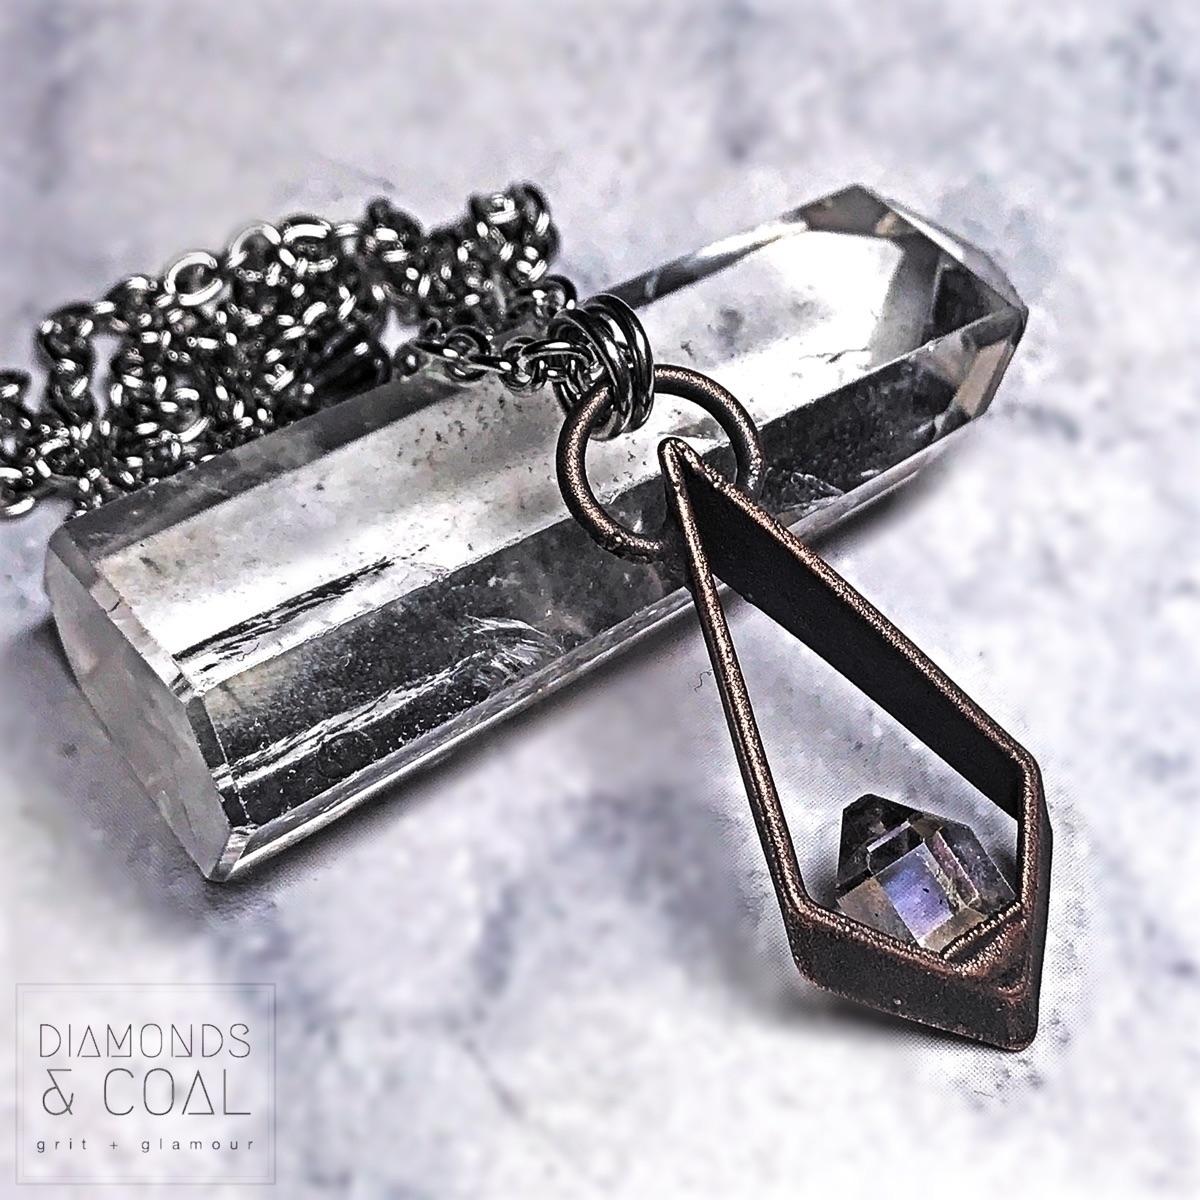 Angel Aura Herkimer pics -  - crystaljewelry#rawcrystals - diamondsandcoaljewelry | ello